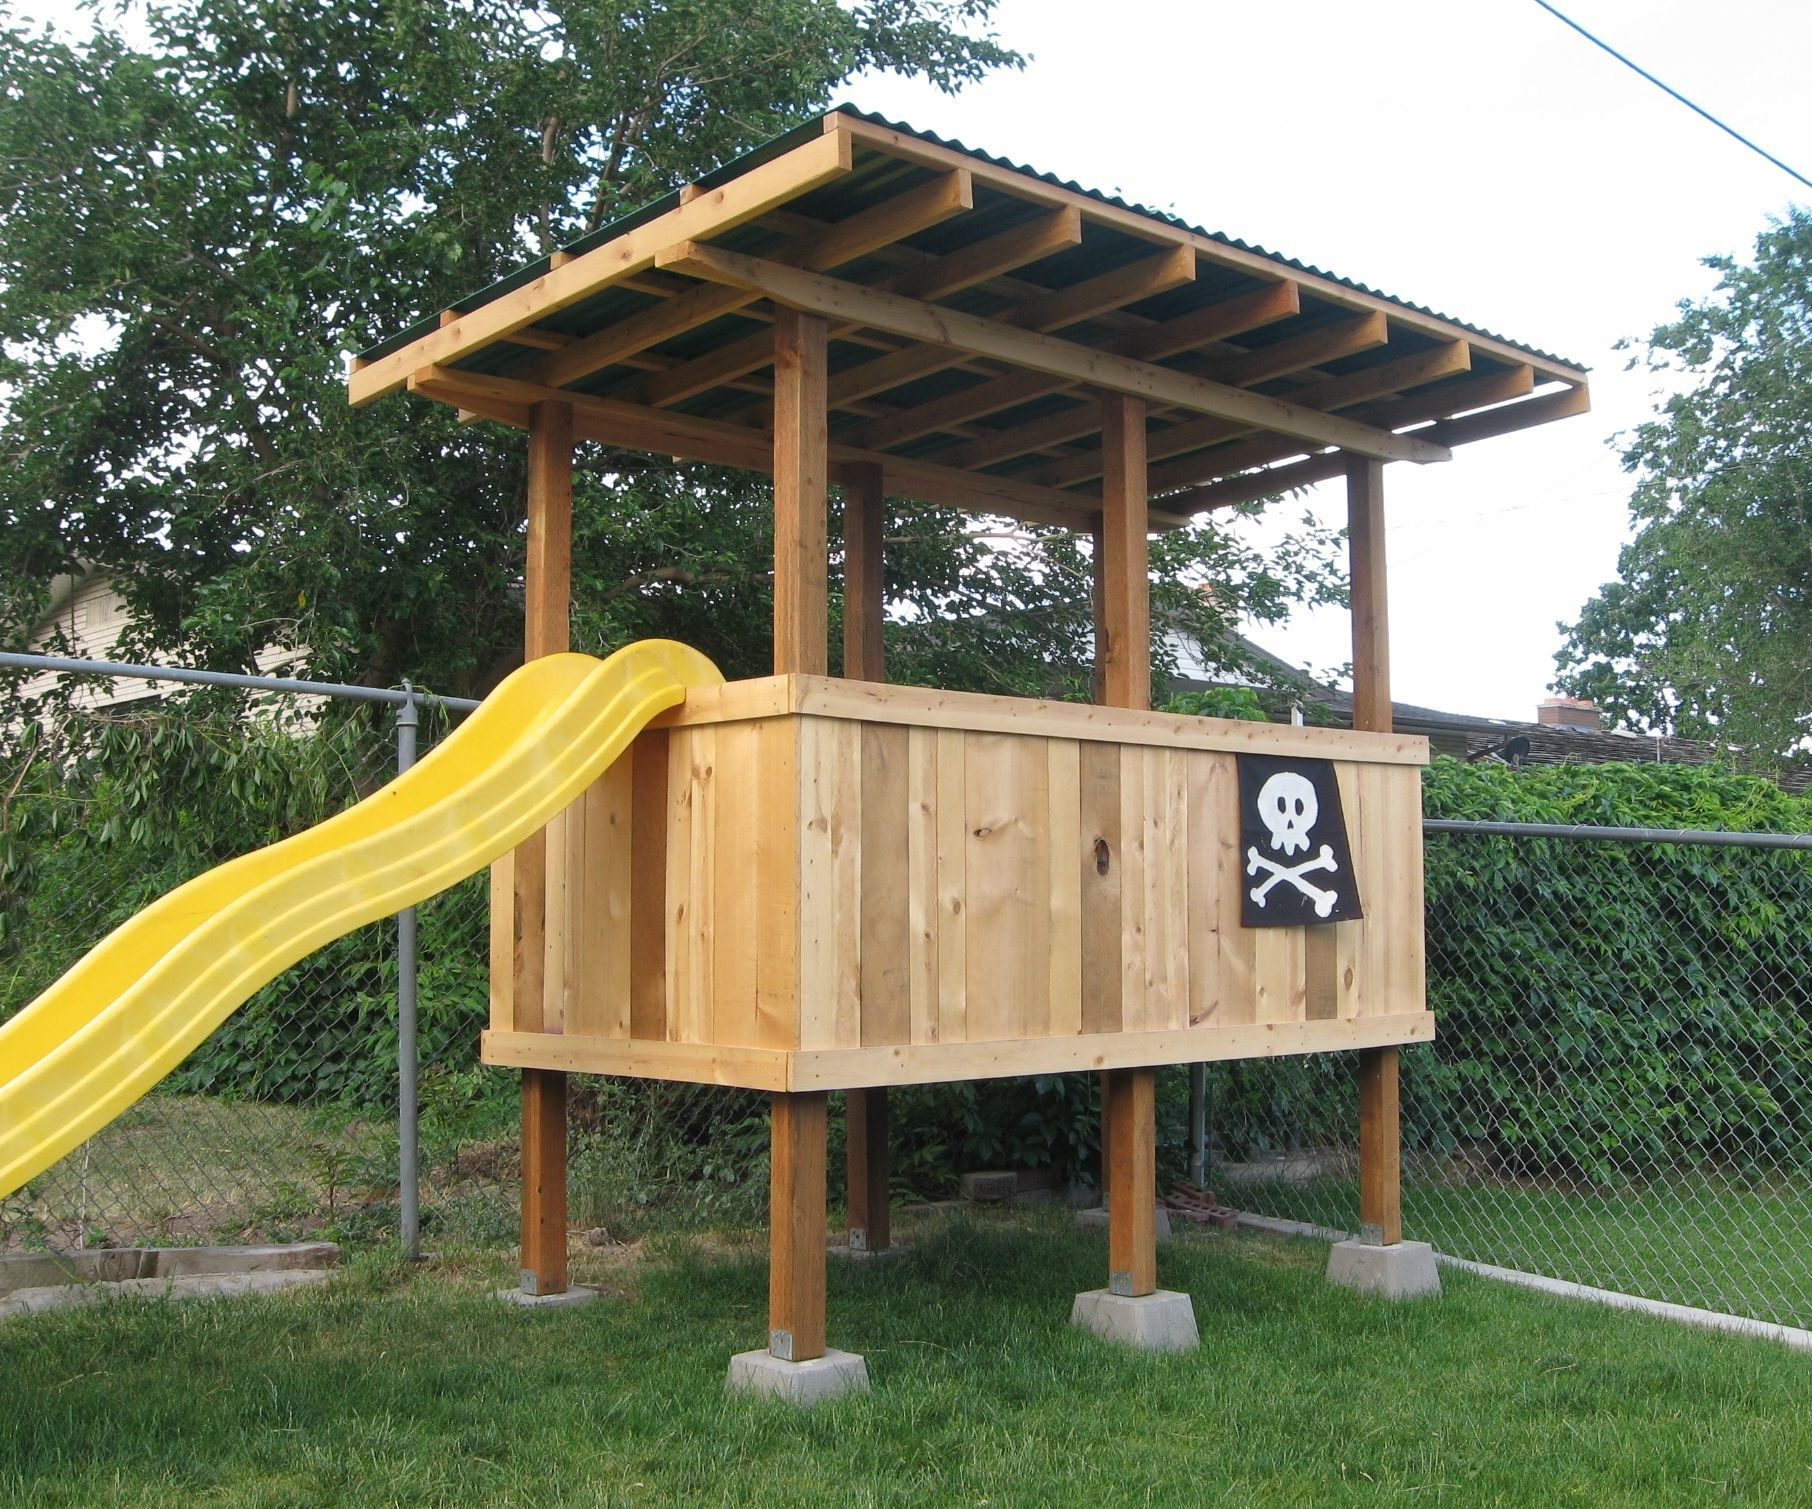 How To Build A Treeless Tree House Diy Backyard Diy Playground